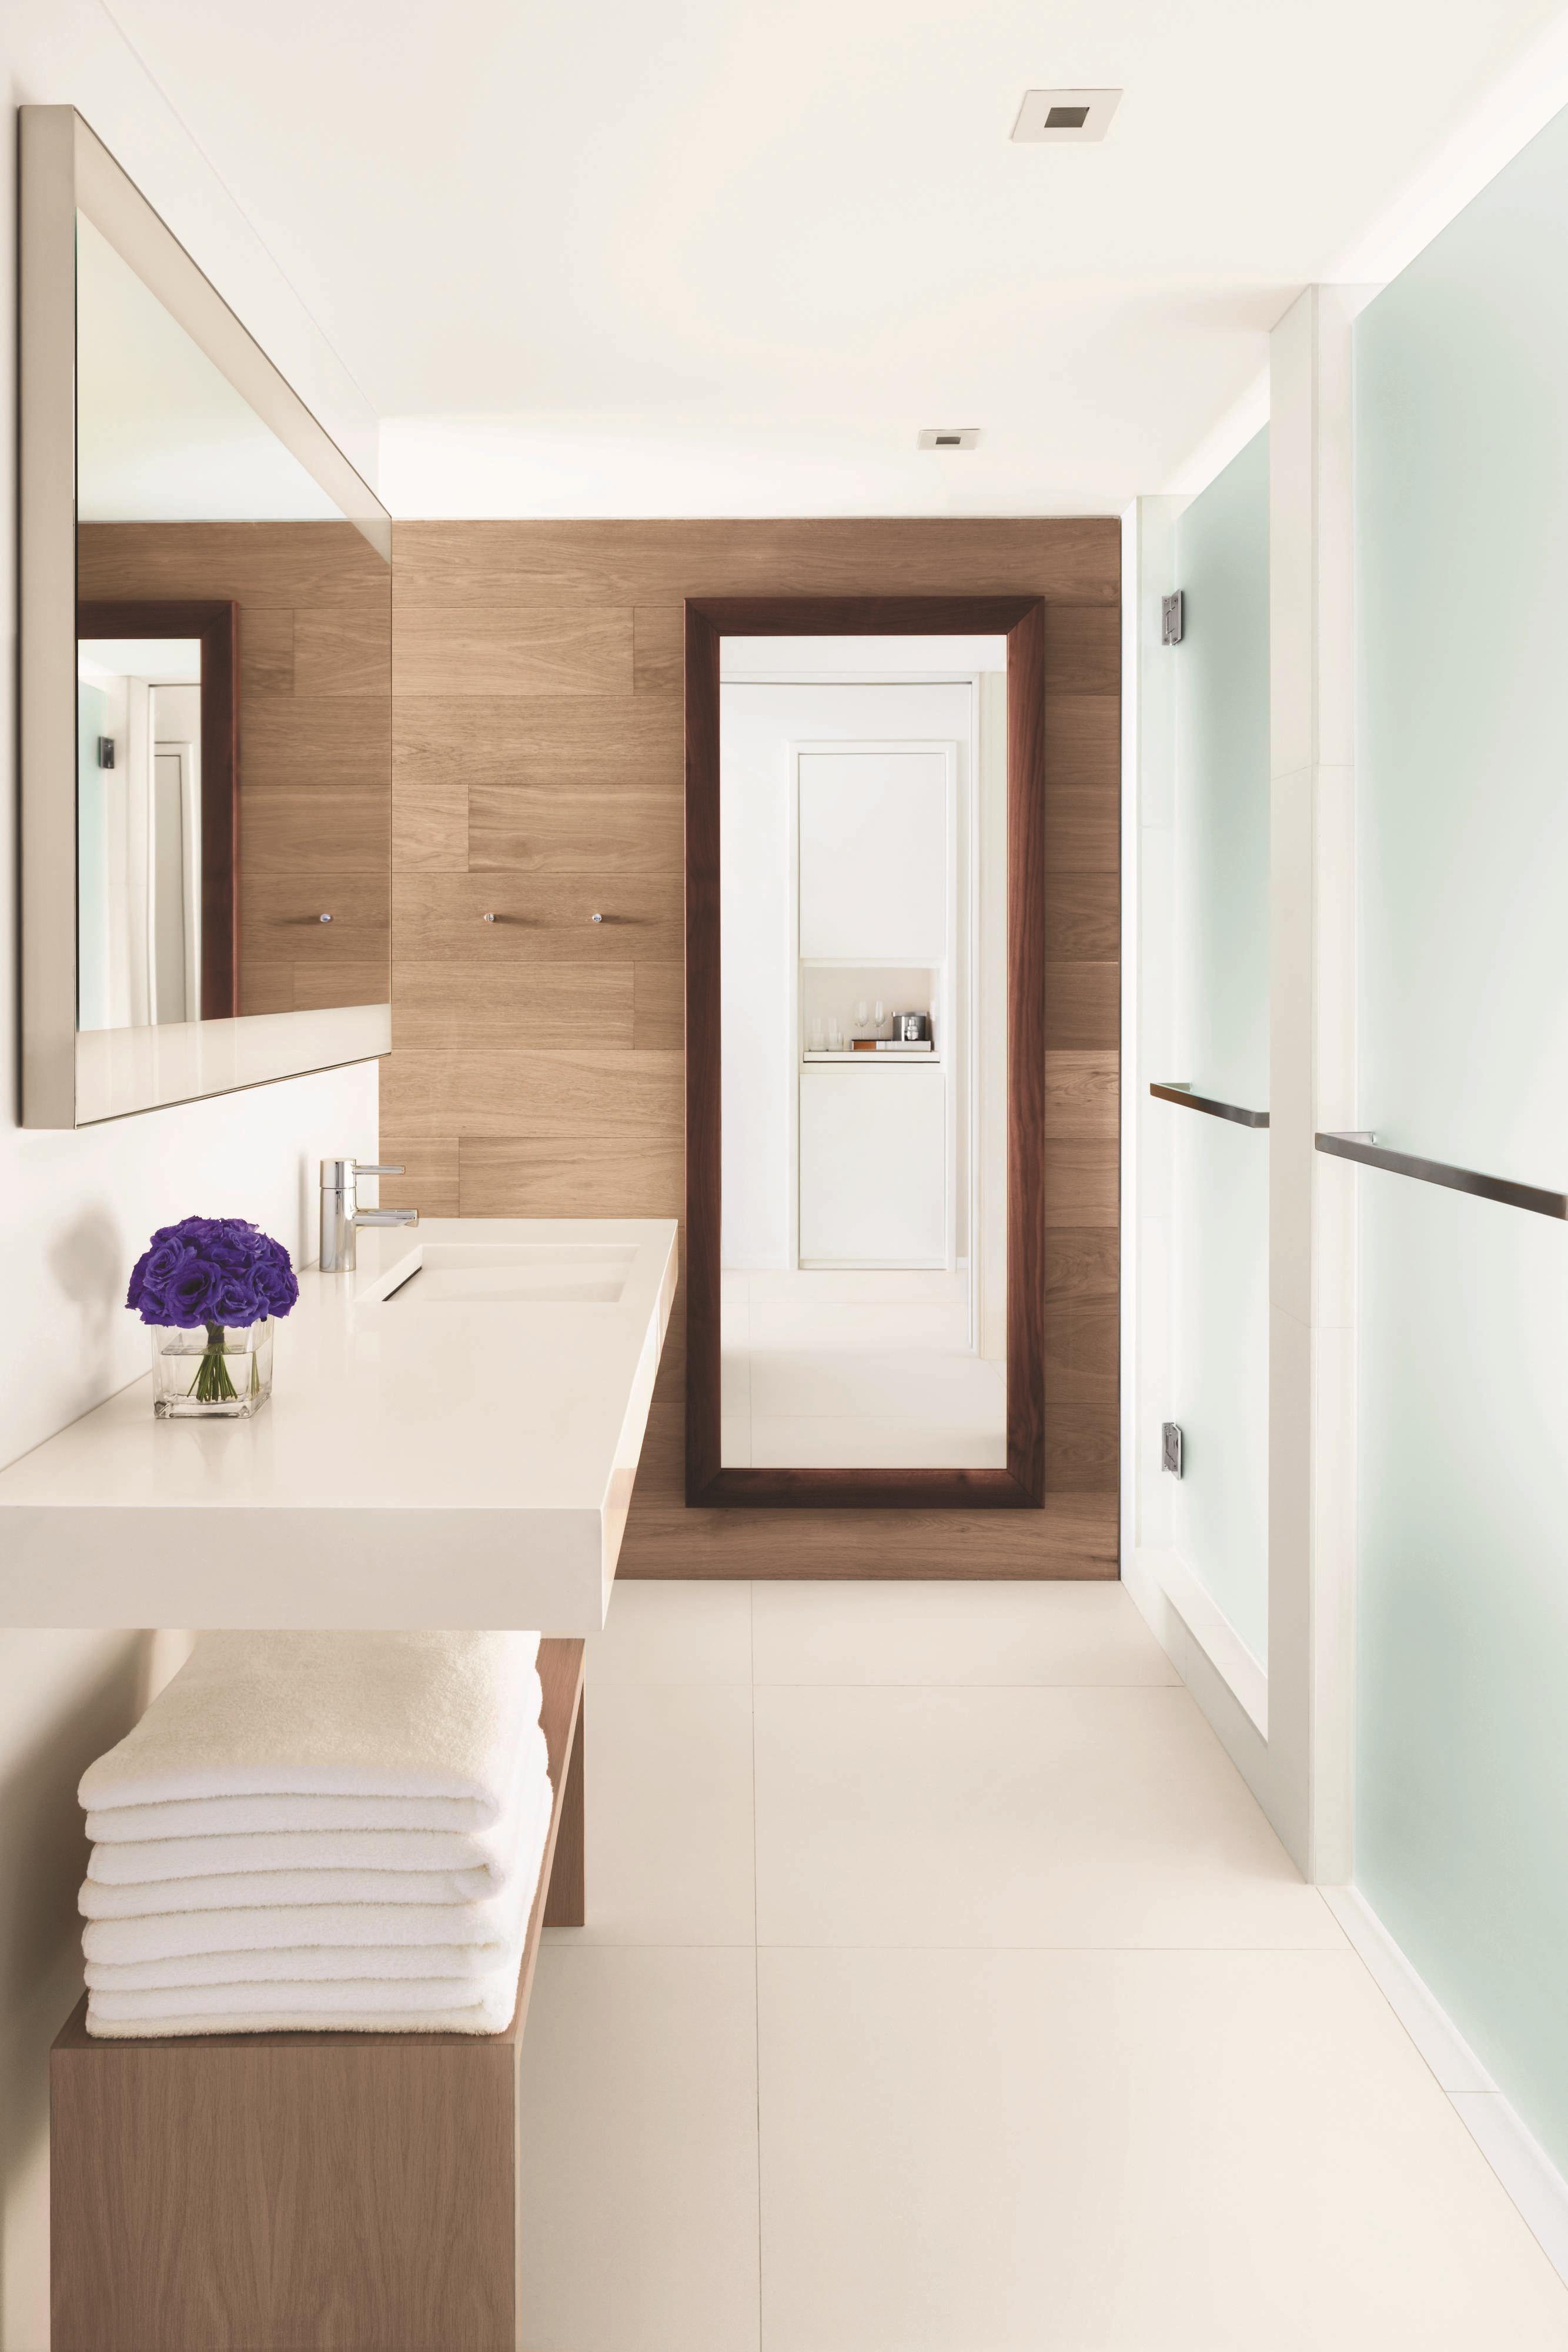 Exotic Hotel Rooms: Miami Beach, FL Luxury Oceanfront Hotel